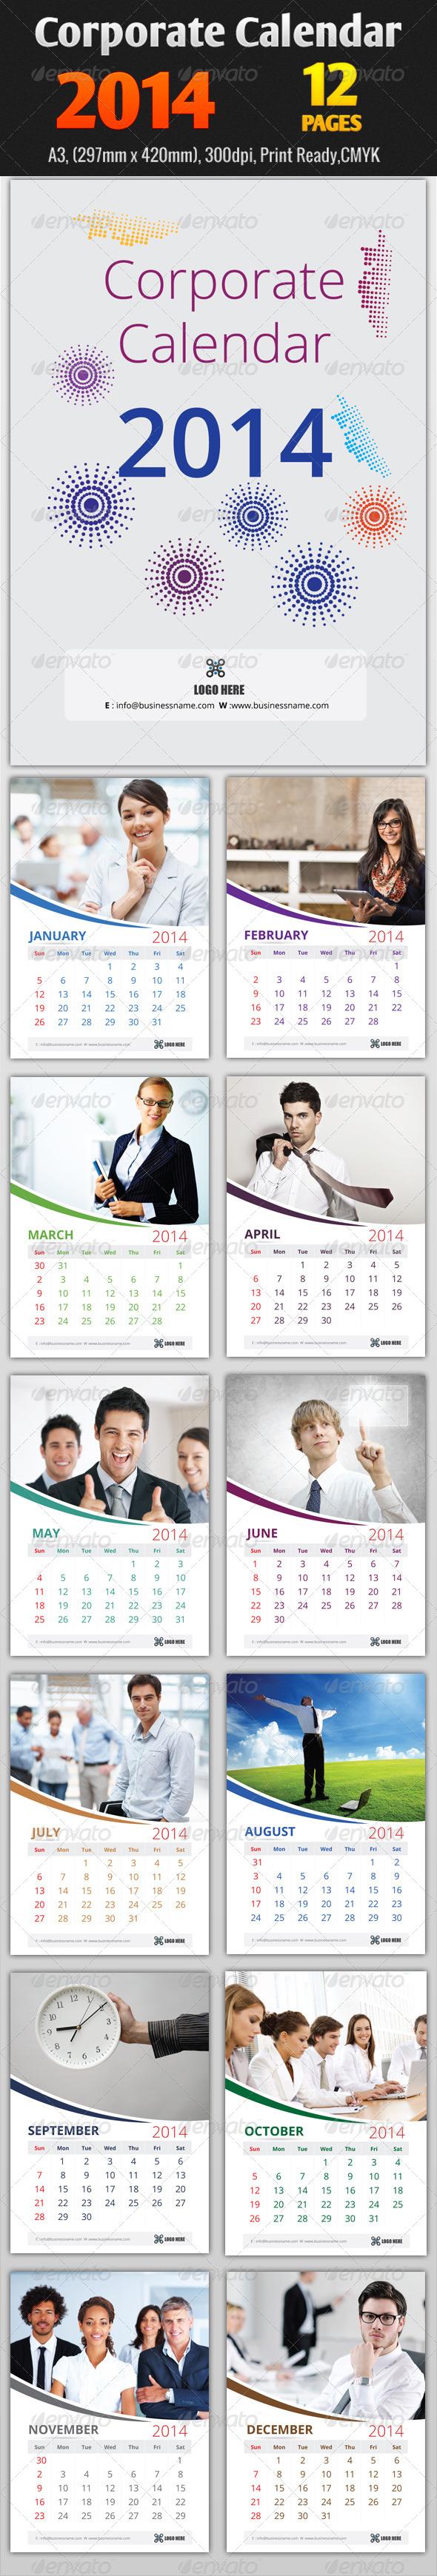 GraphicRiver Corporate Calendar 2014 Templates 5493145